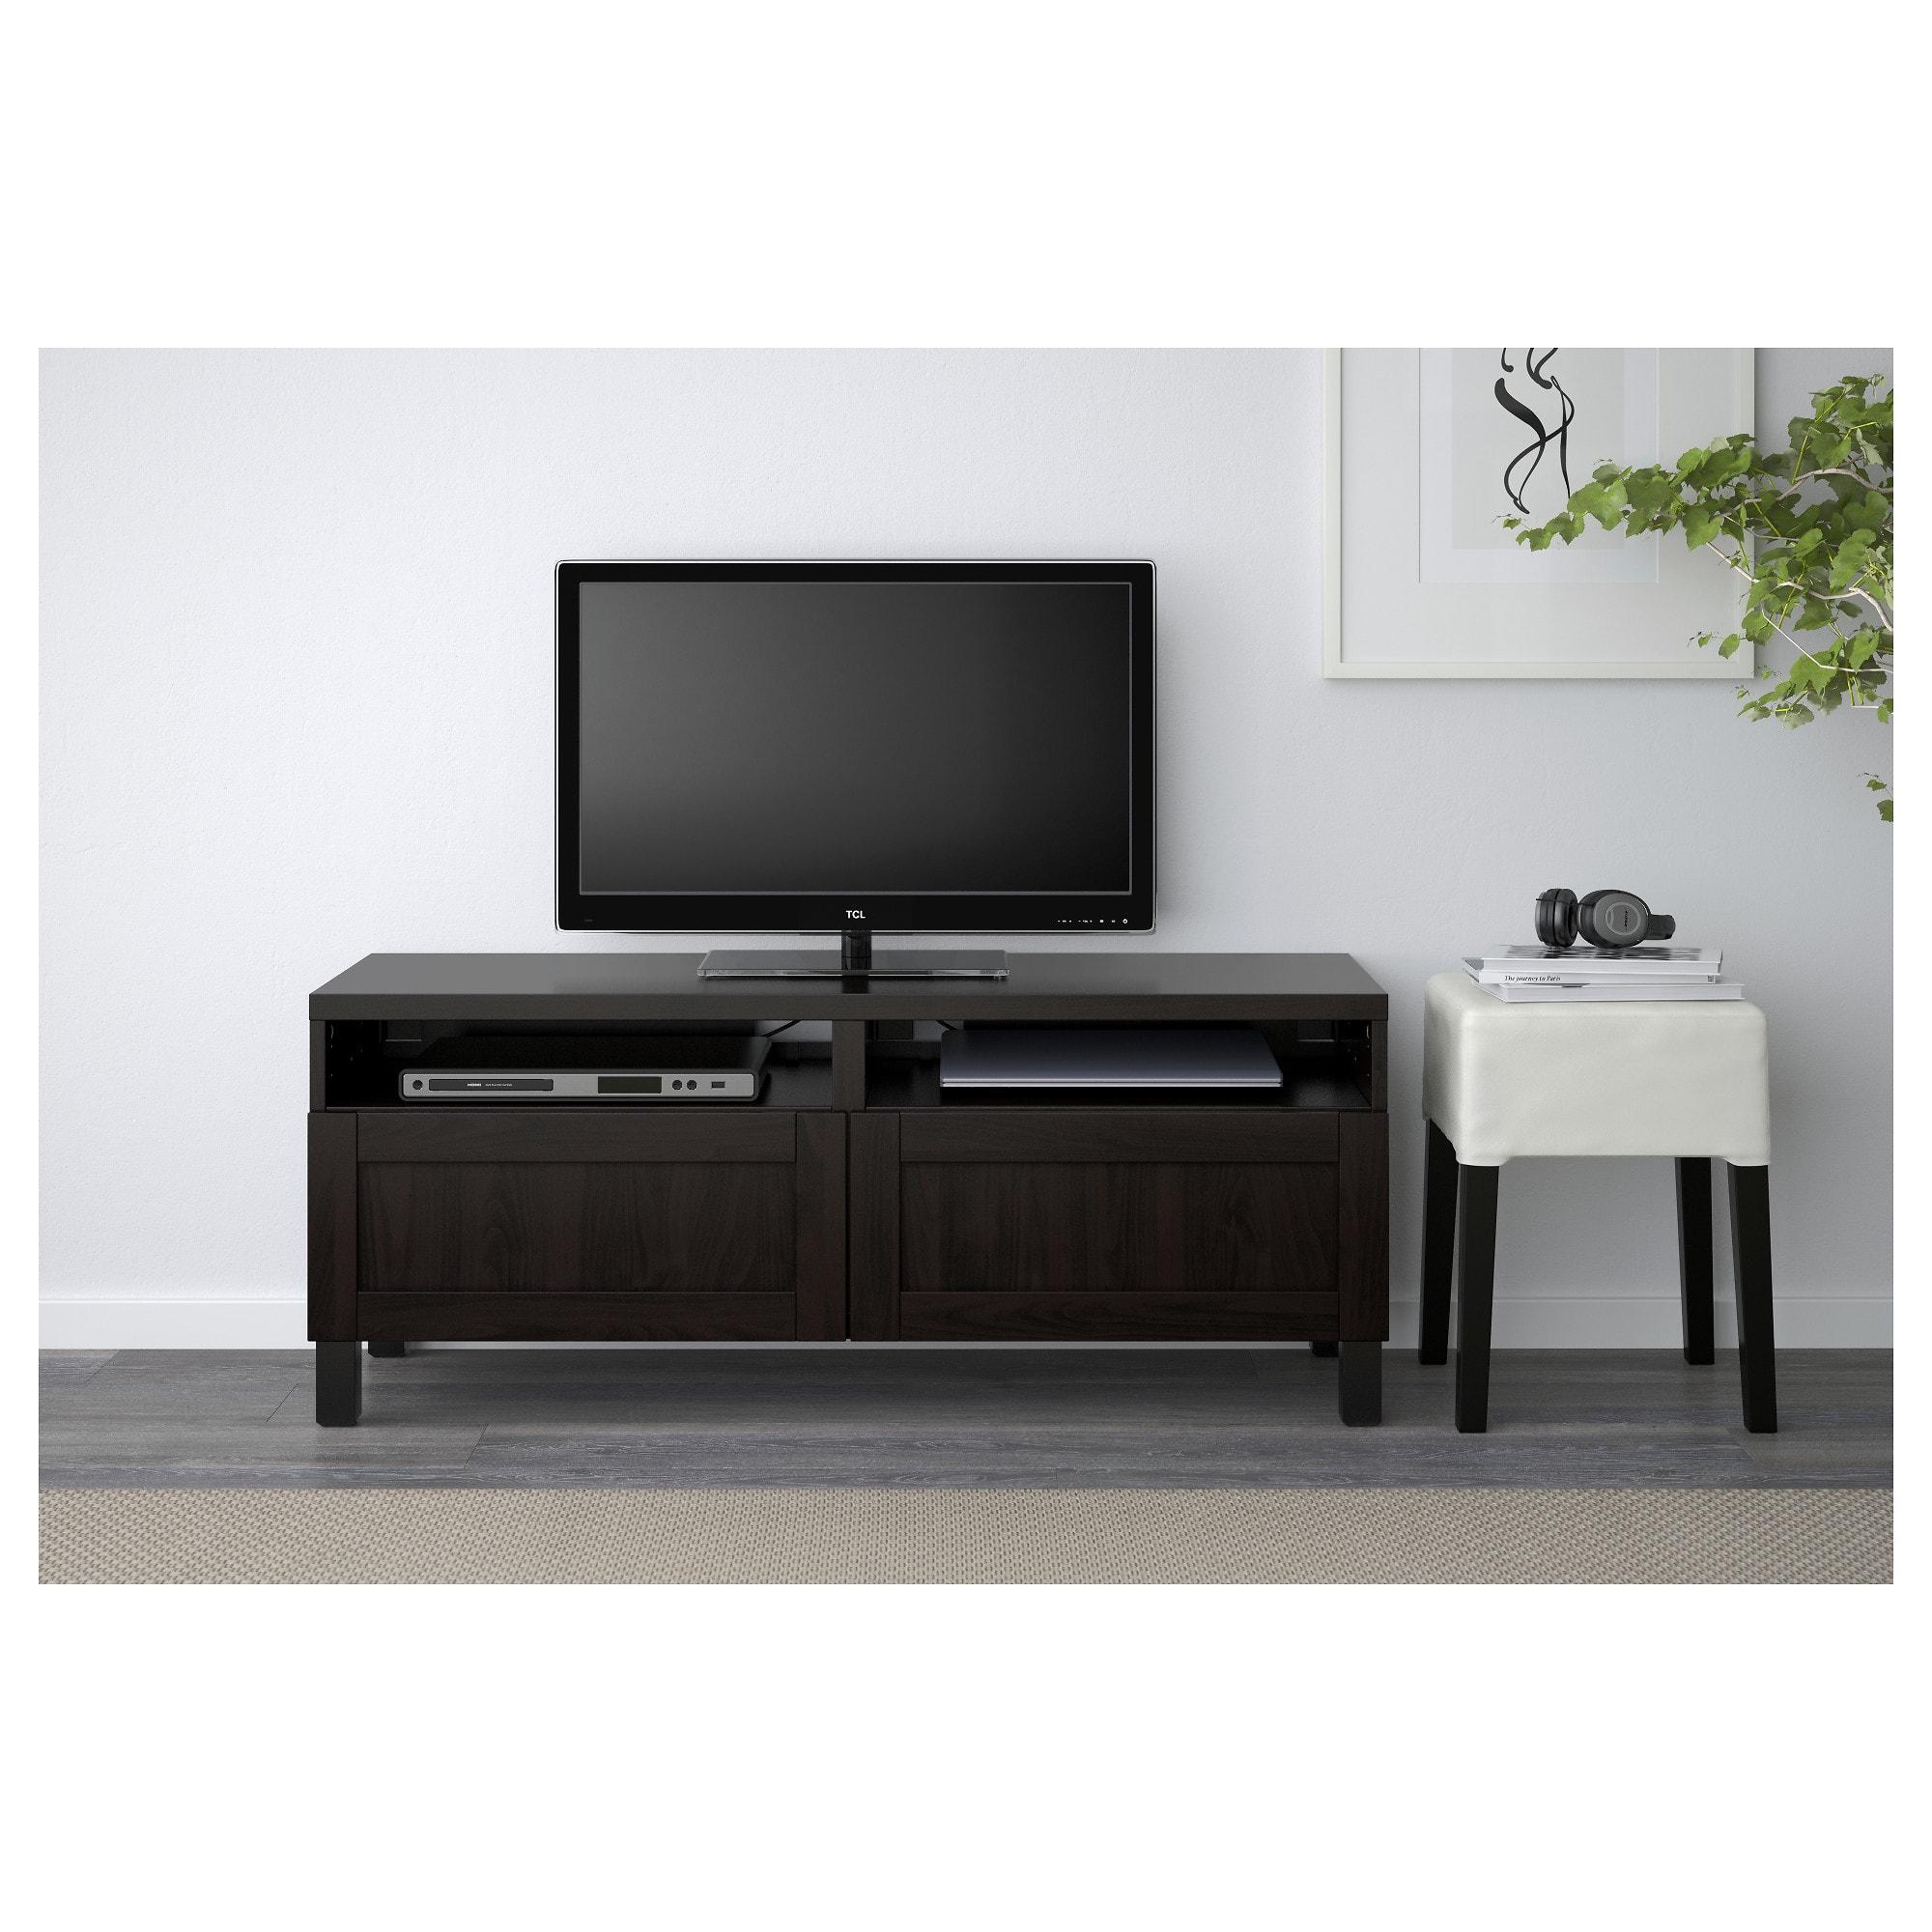 IKEA BESTÅ TV unit with drawers Hanviken blackbrown